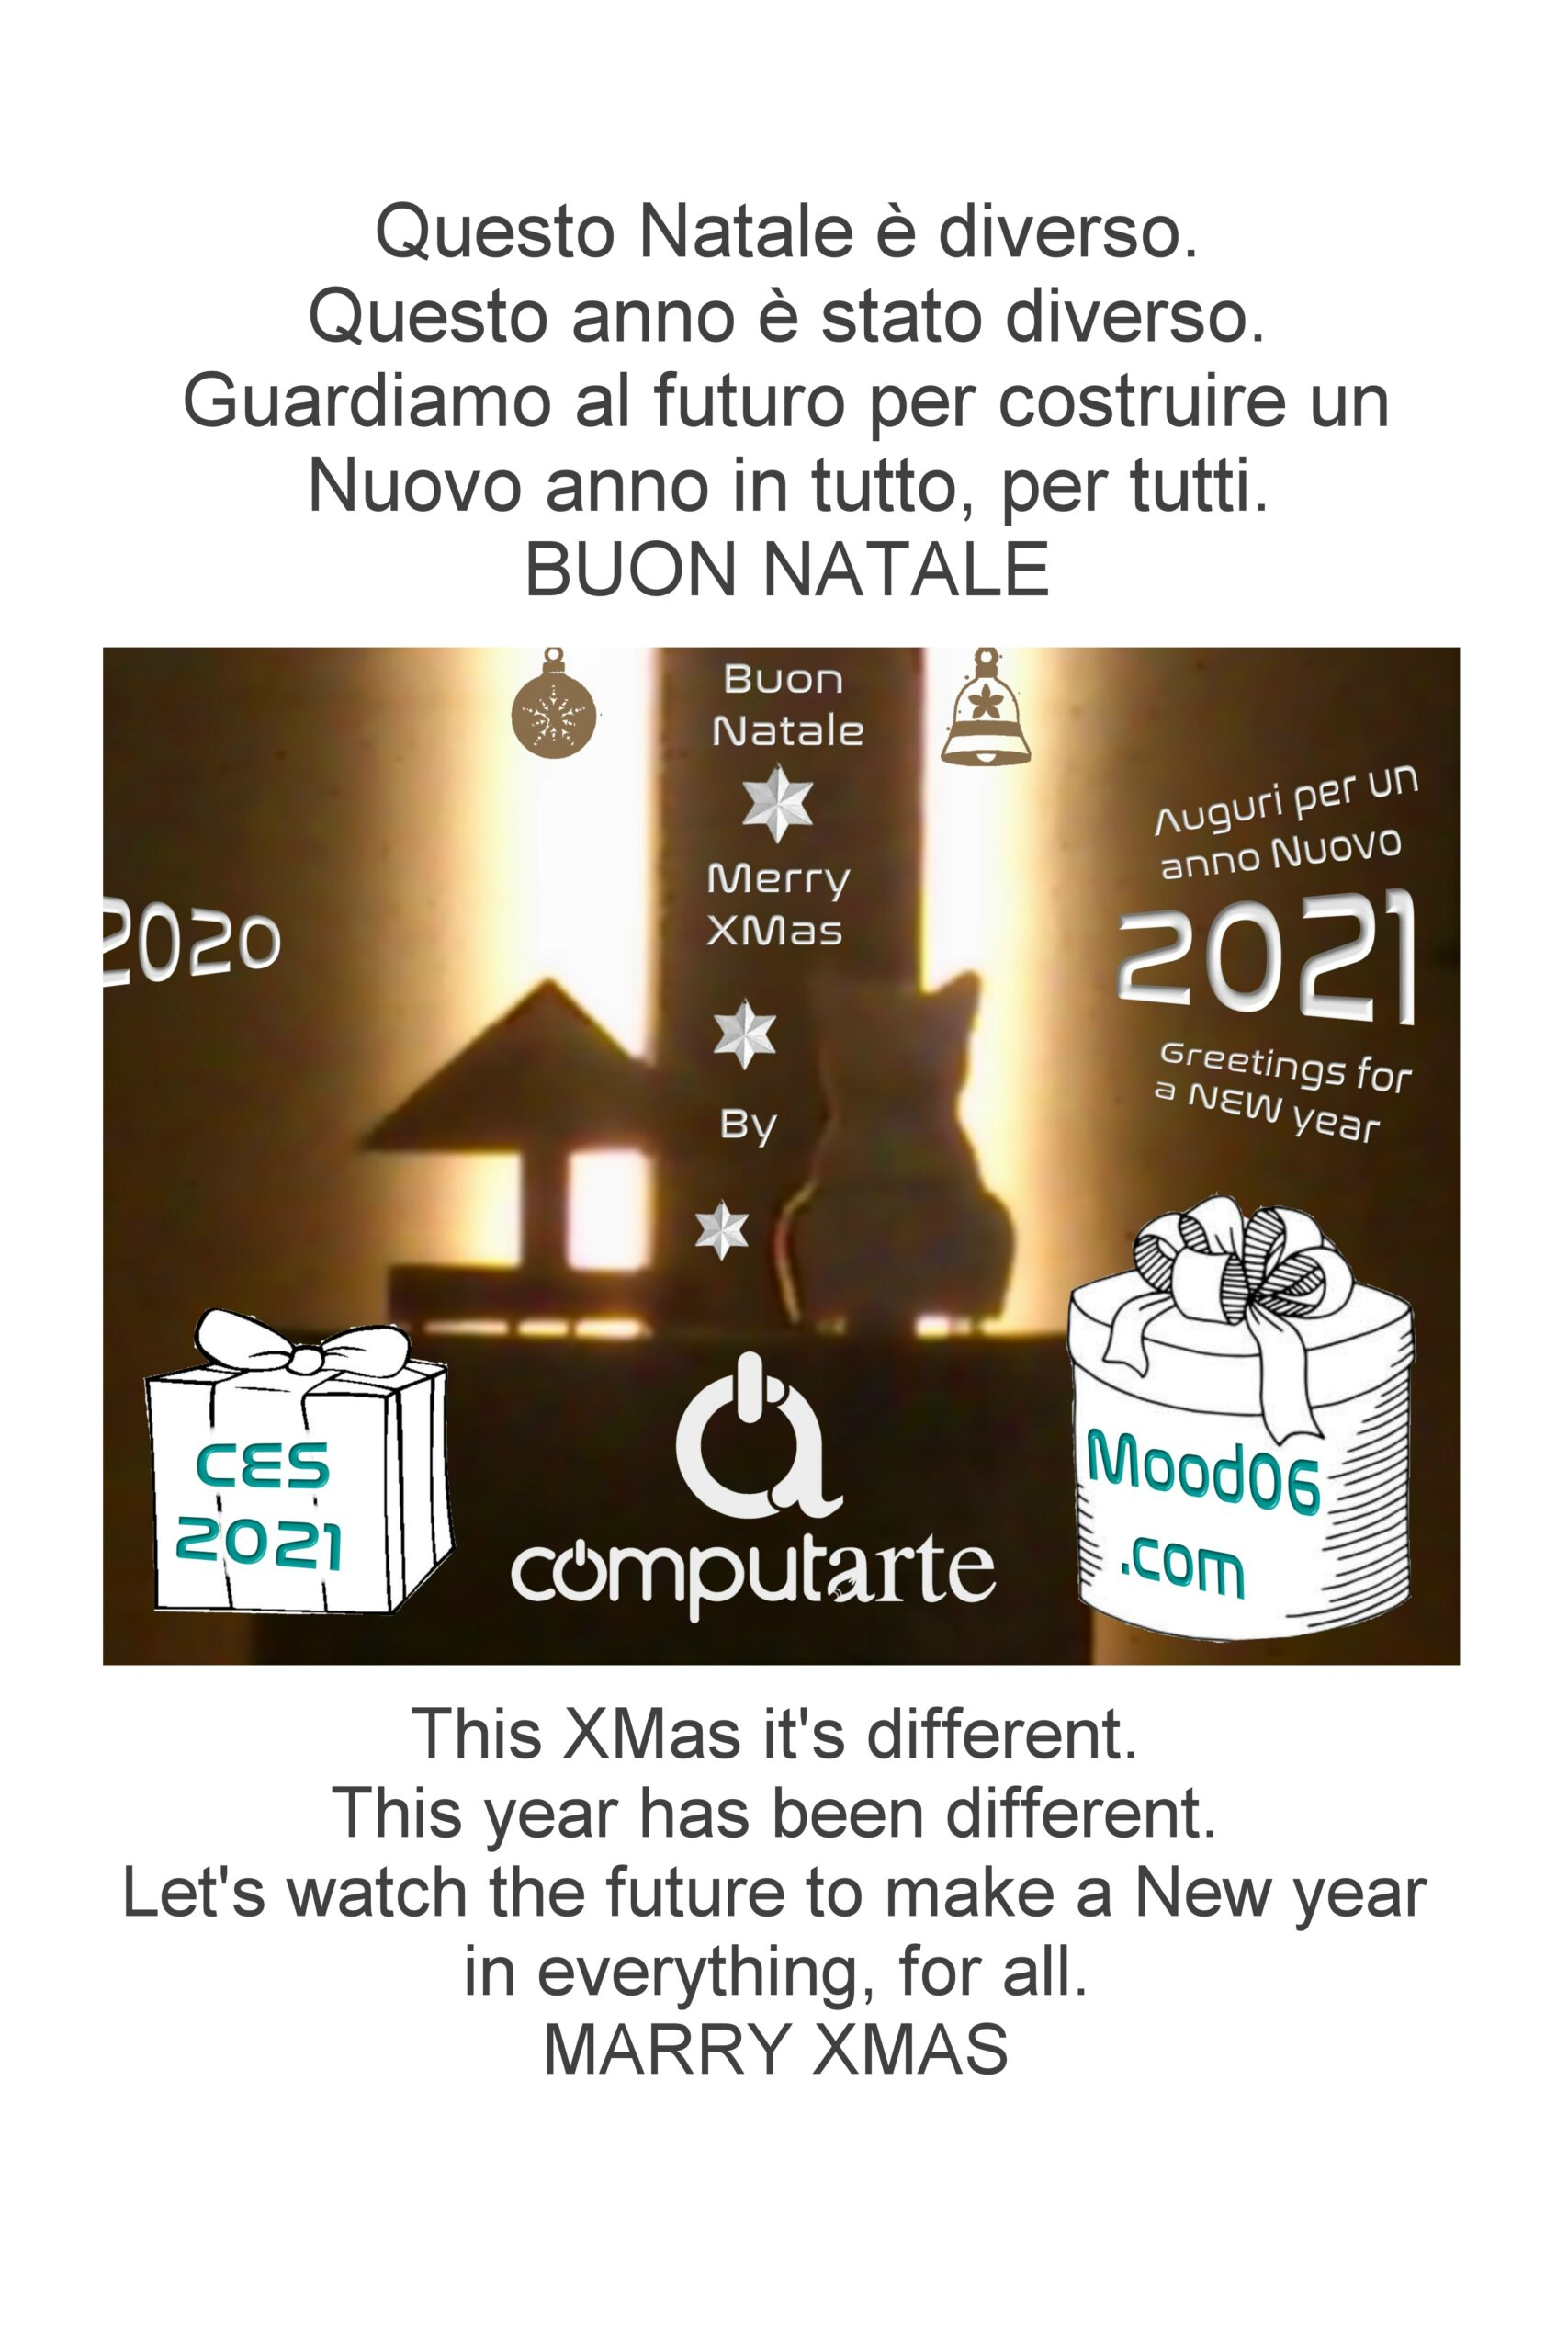 ComputArte 2020: Buon Natale – Merry Xmas